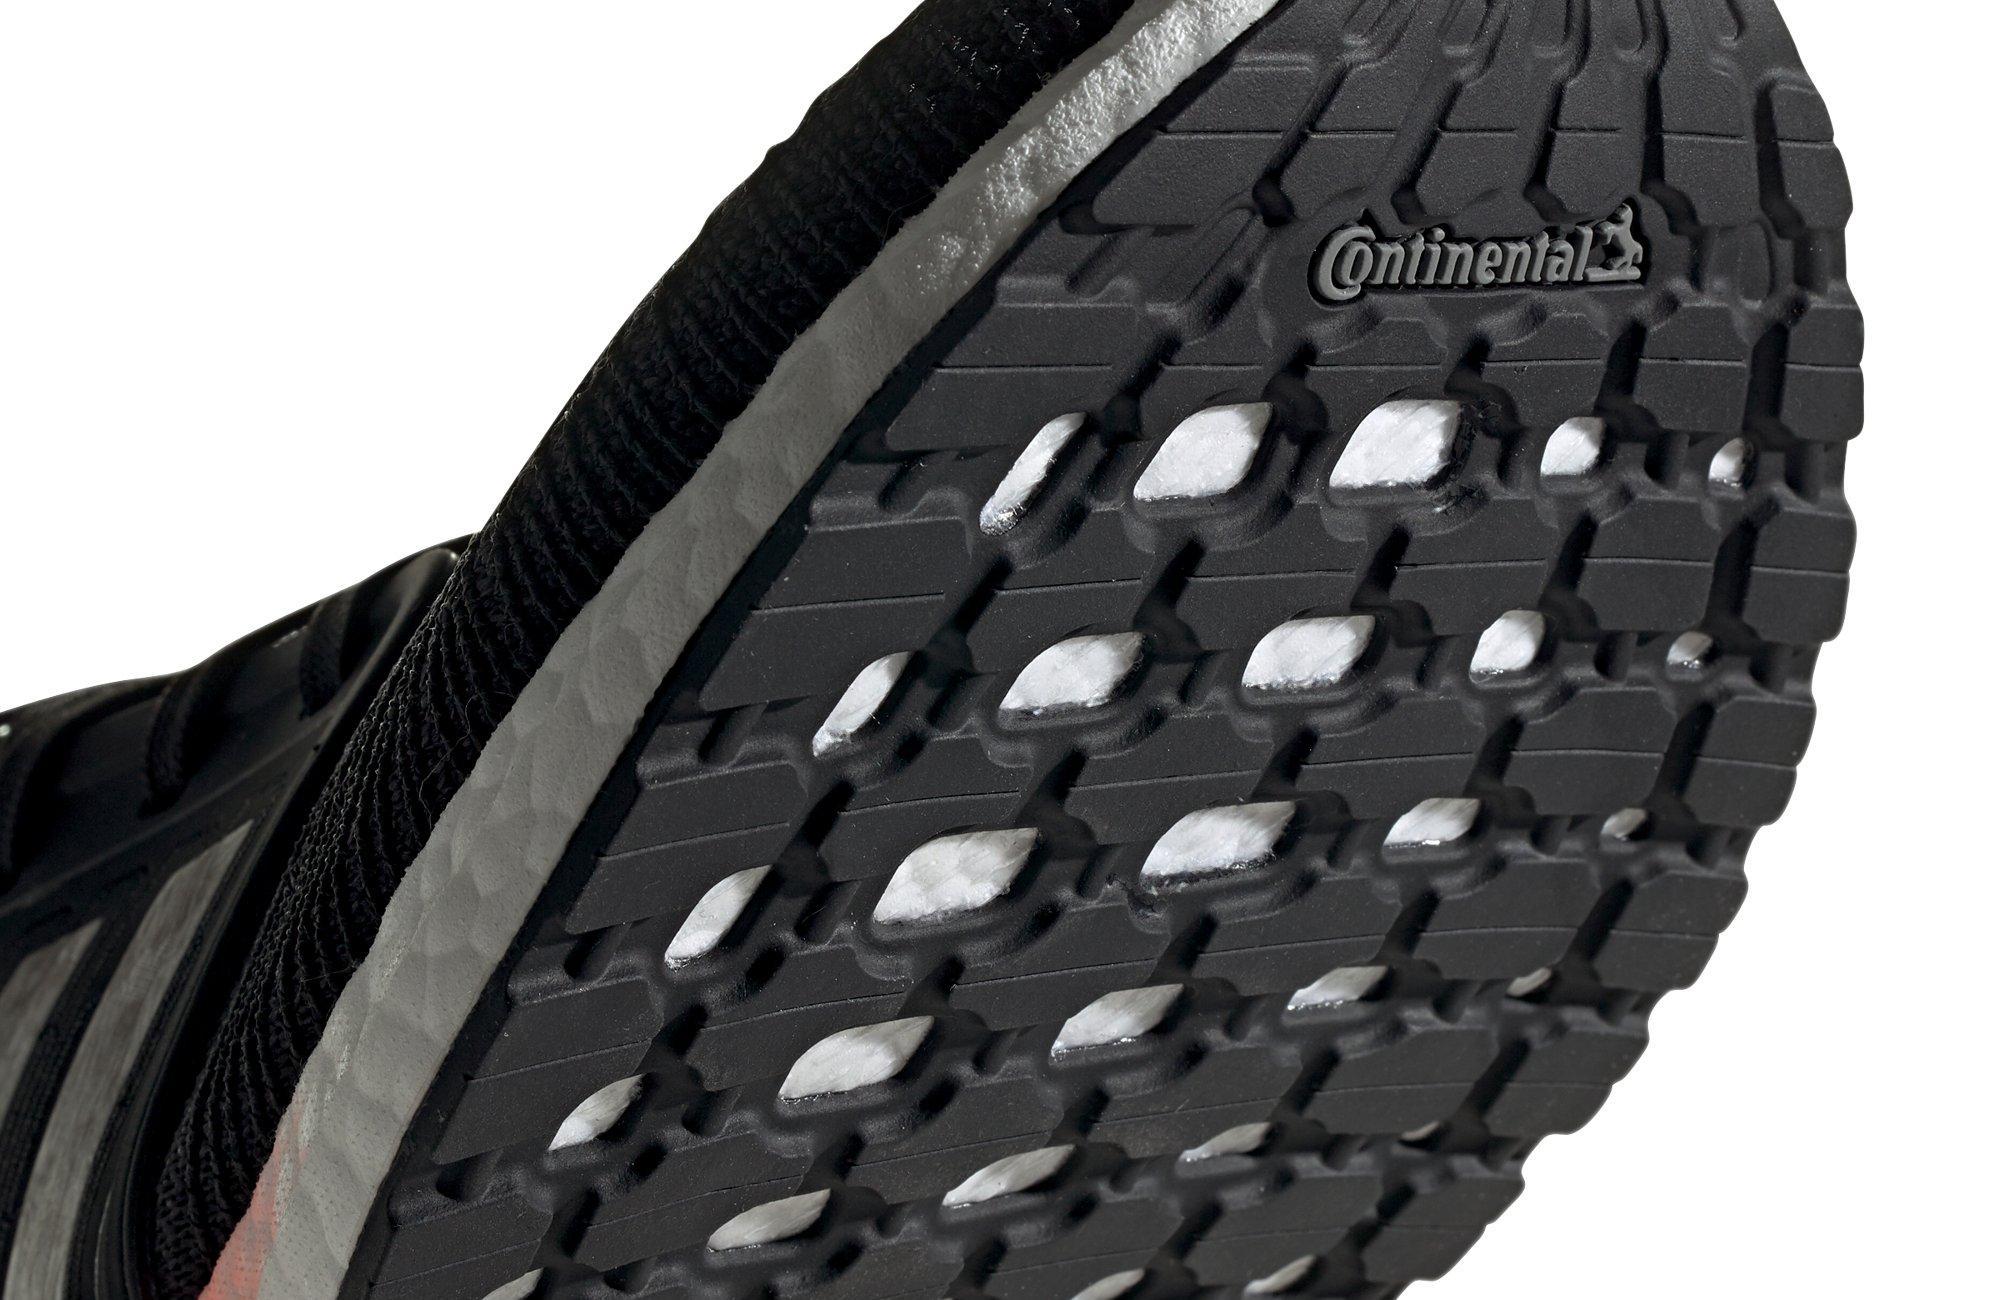 Continental rubber sole